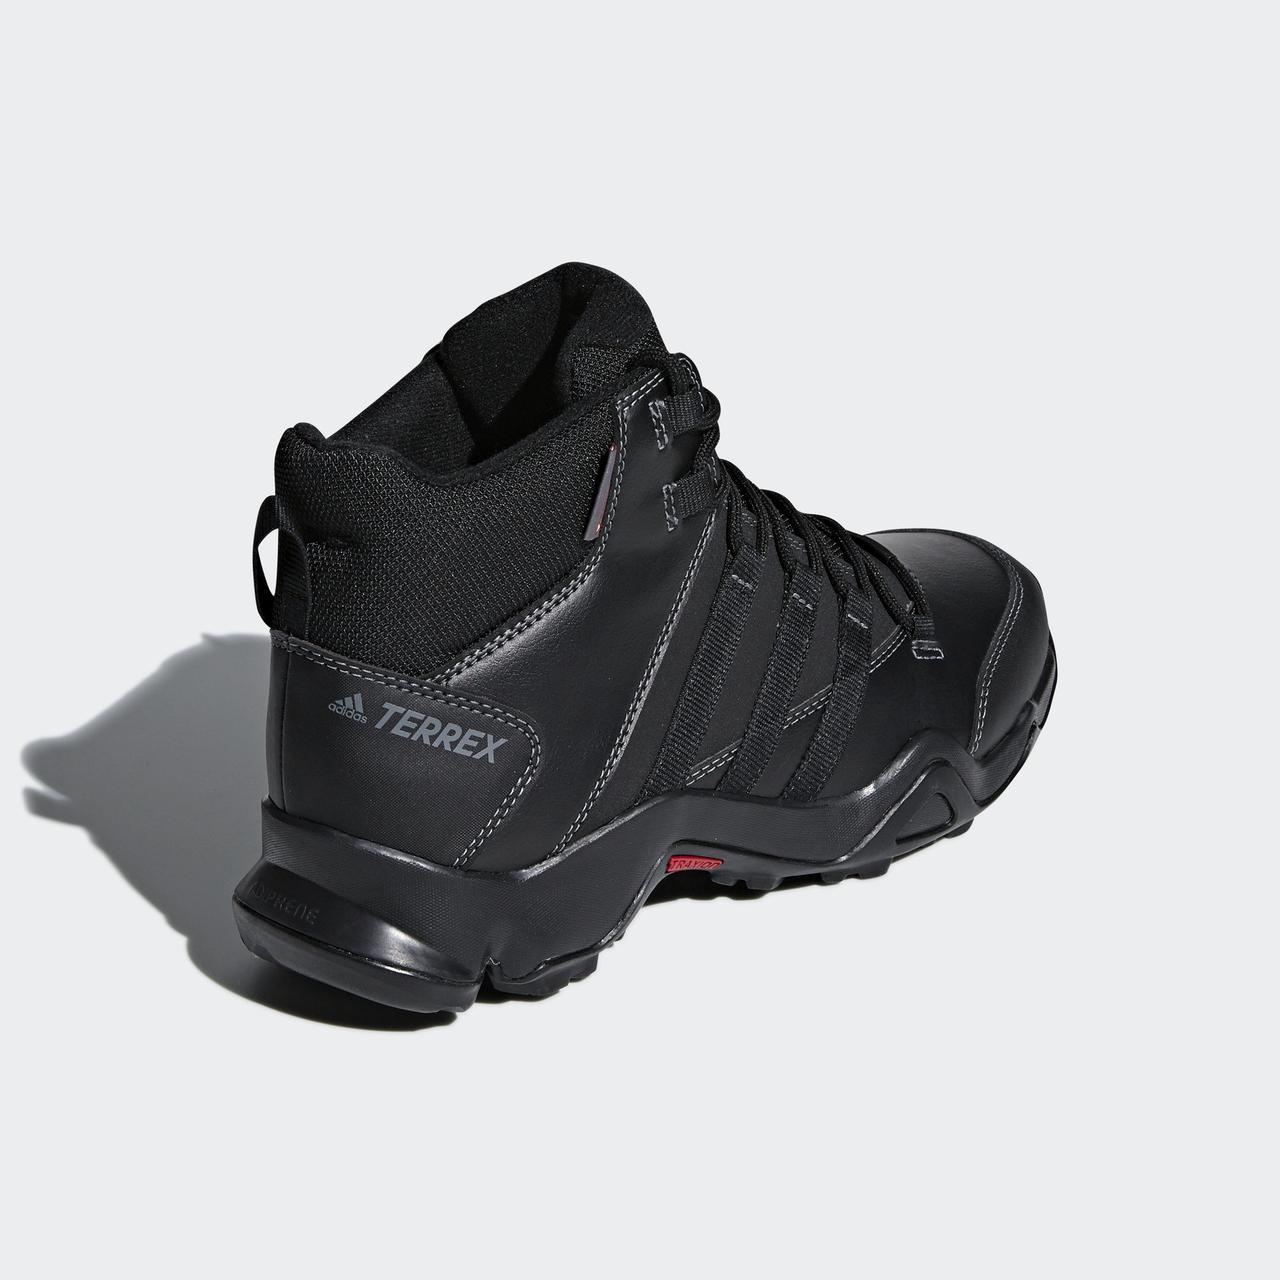 ... фото Мужские кроссовки Adidas Performance Terrex AX2R Beta Mid  Climawarm (Артикул  S80740), фото ... 2f65fc1097d